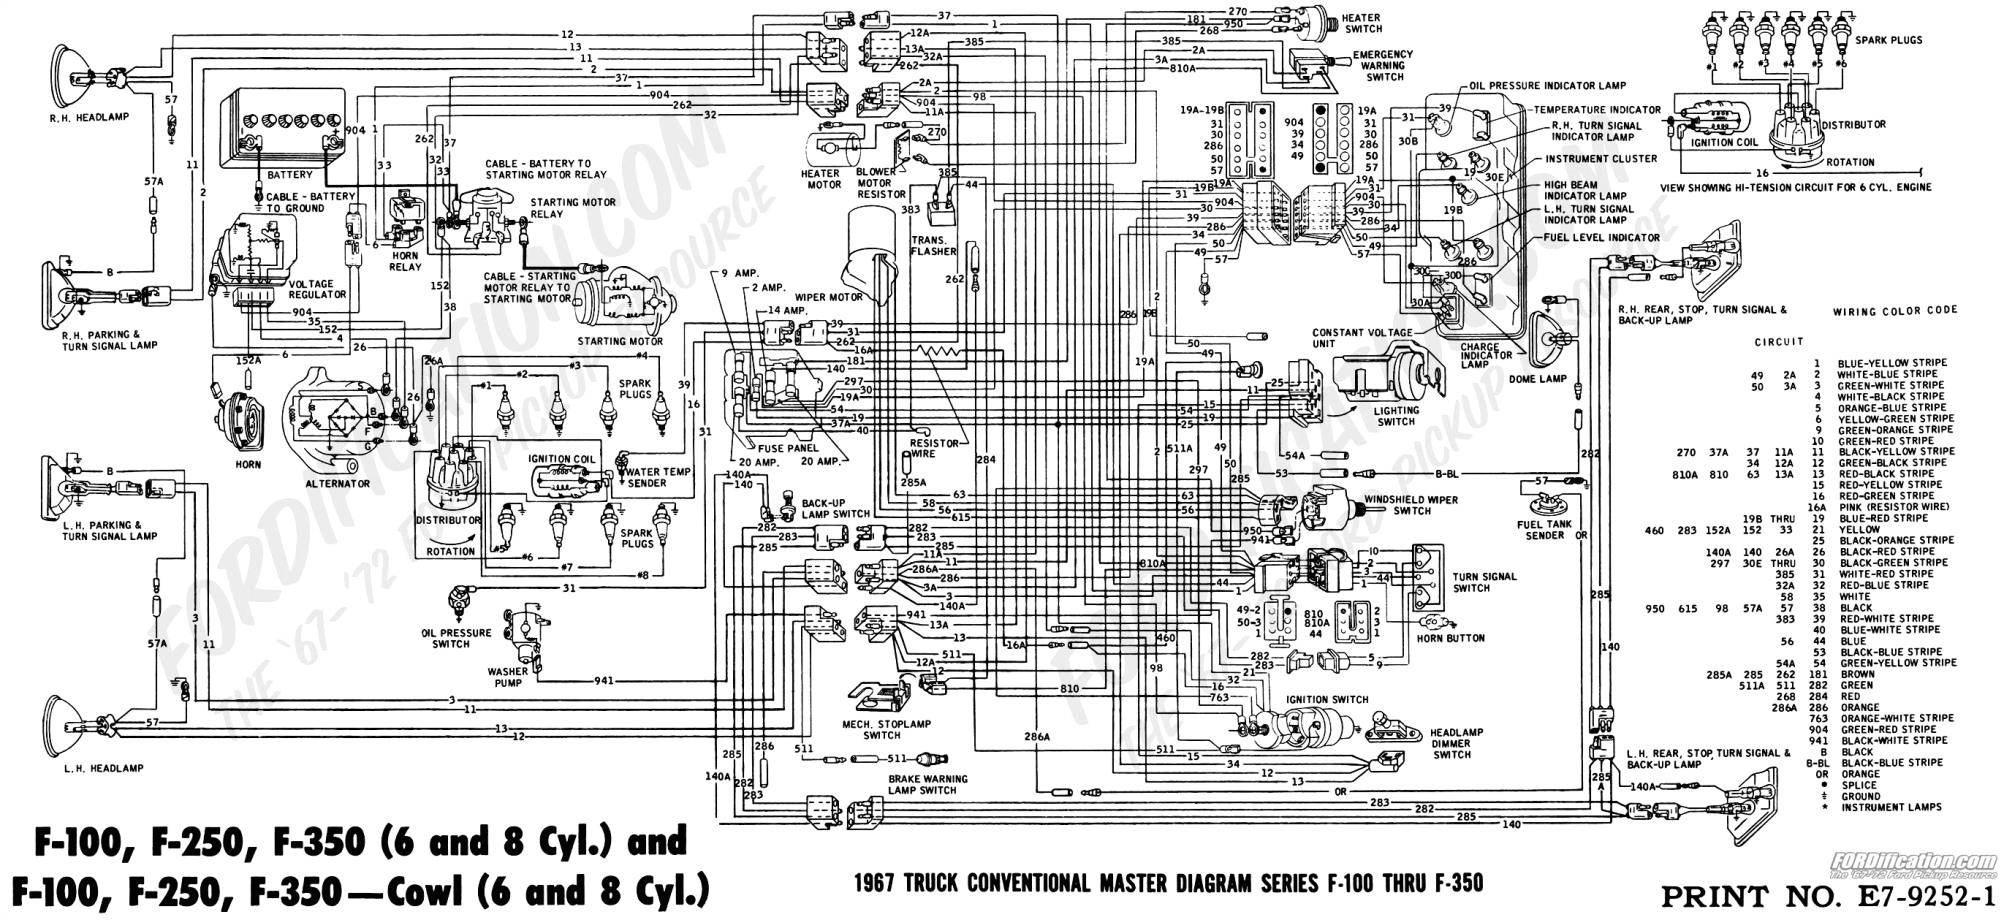 1986 ford f150 wiring wiring diagram expert 150 1986 f ford headlight wiring wiring diagram datasource